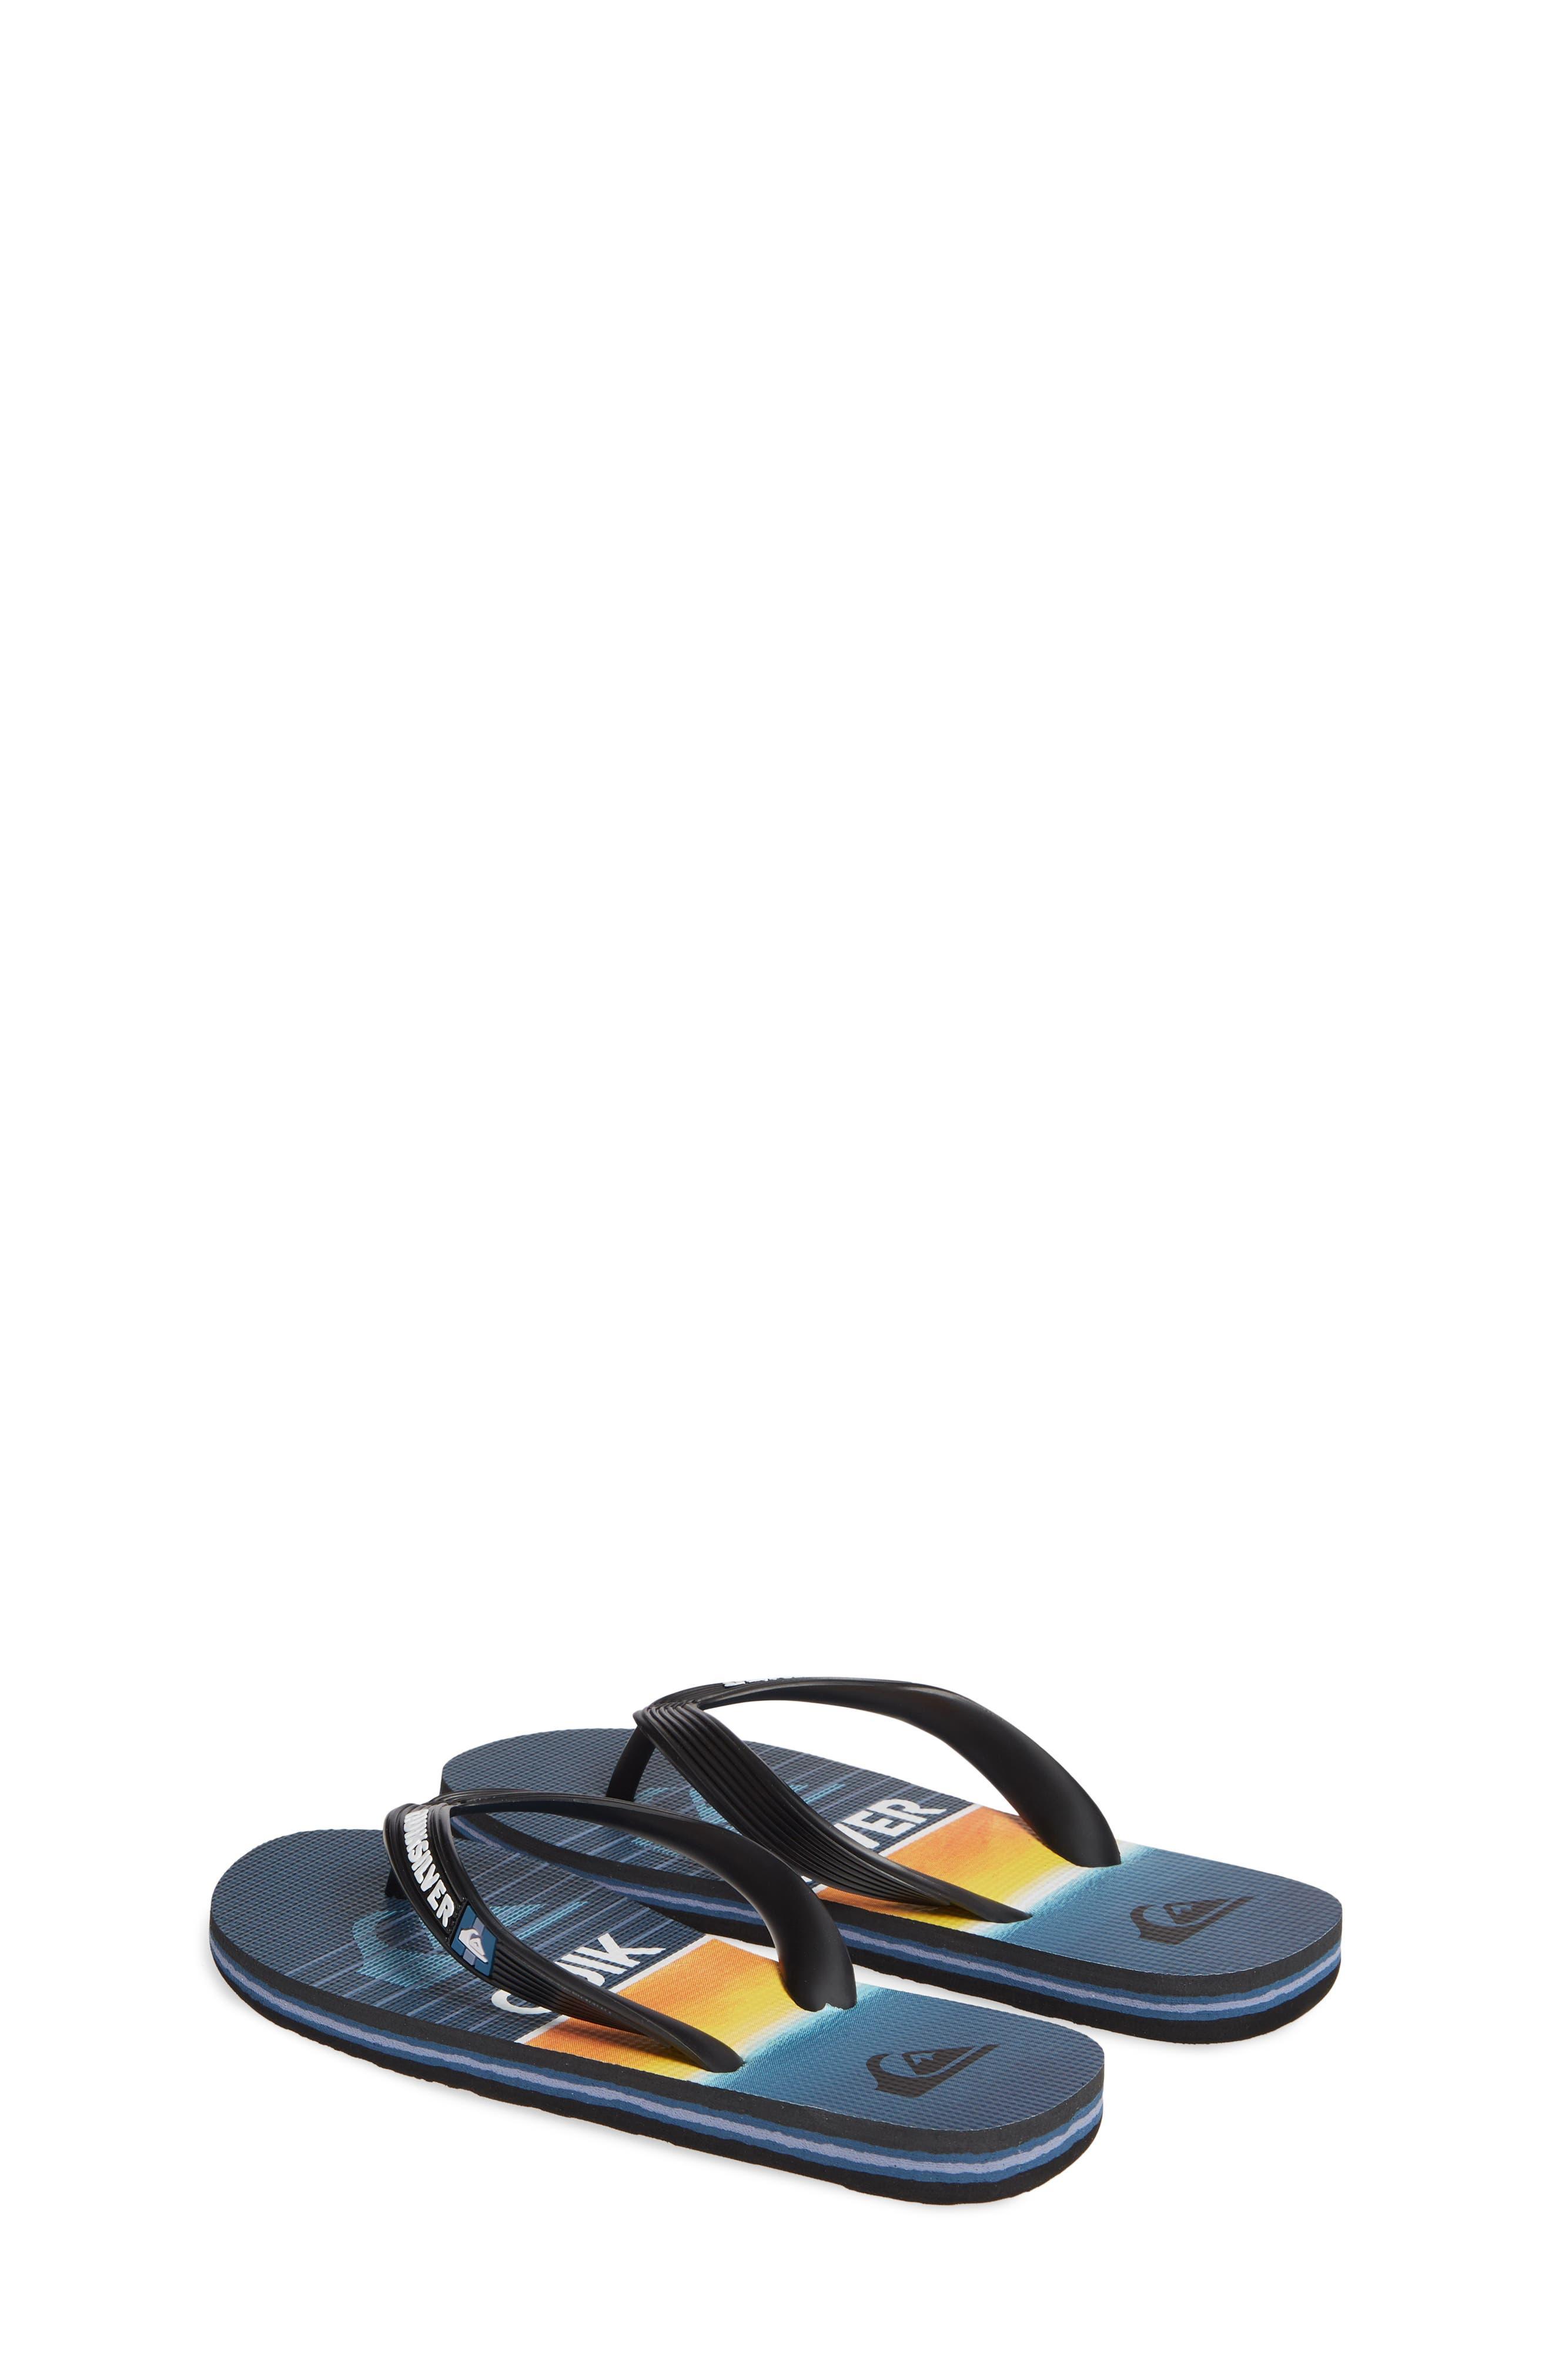 QUIKSILVER, Highline Slab Flip Flop, Alternate thumbnail 3, color, BLACK/ BLUE/ BLUE